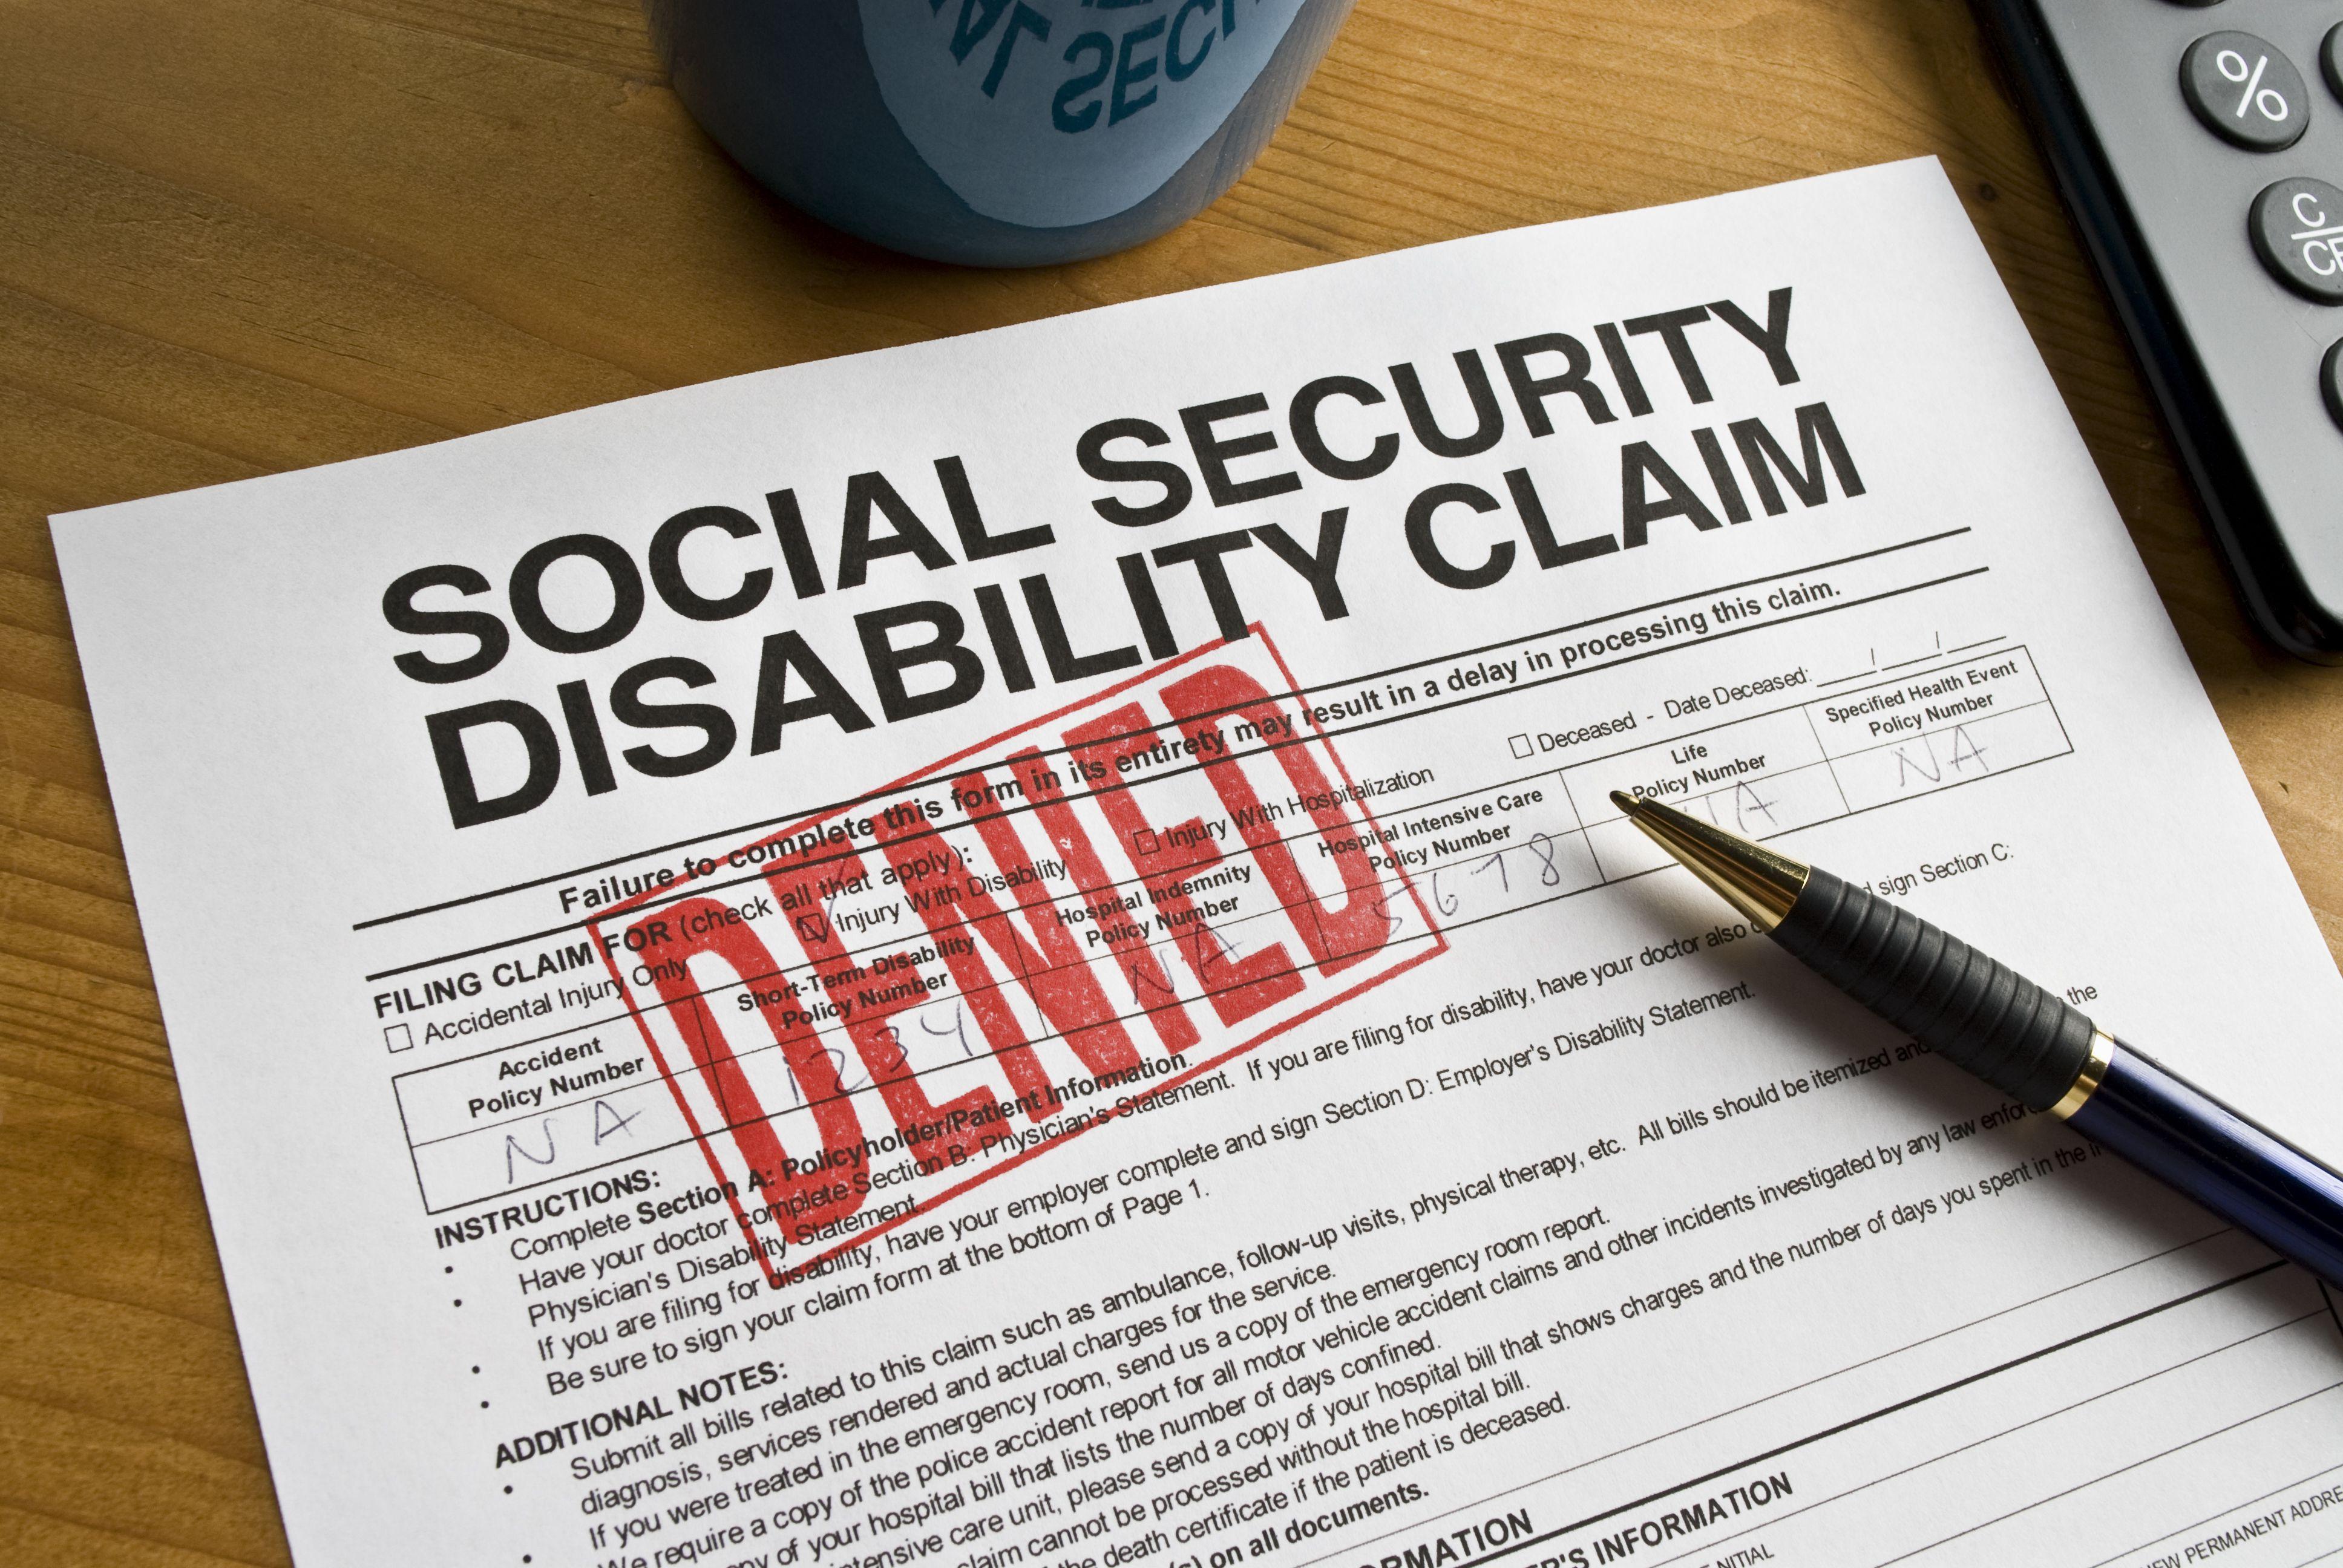 Social security denial